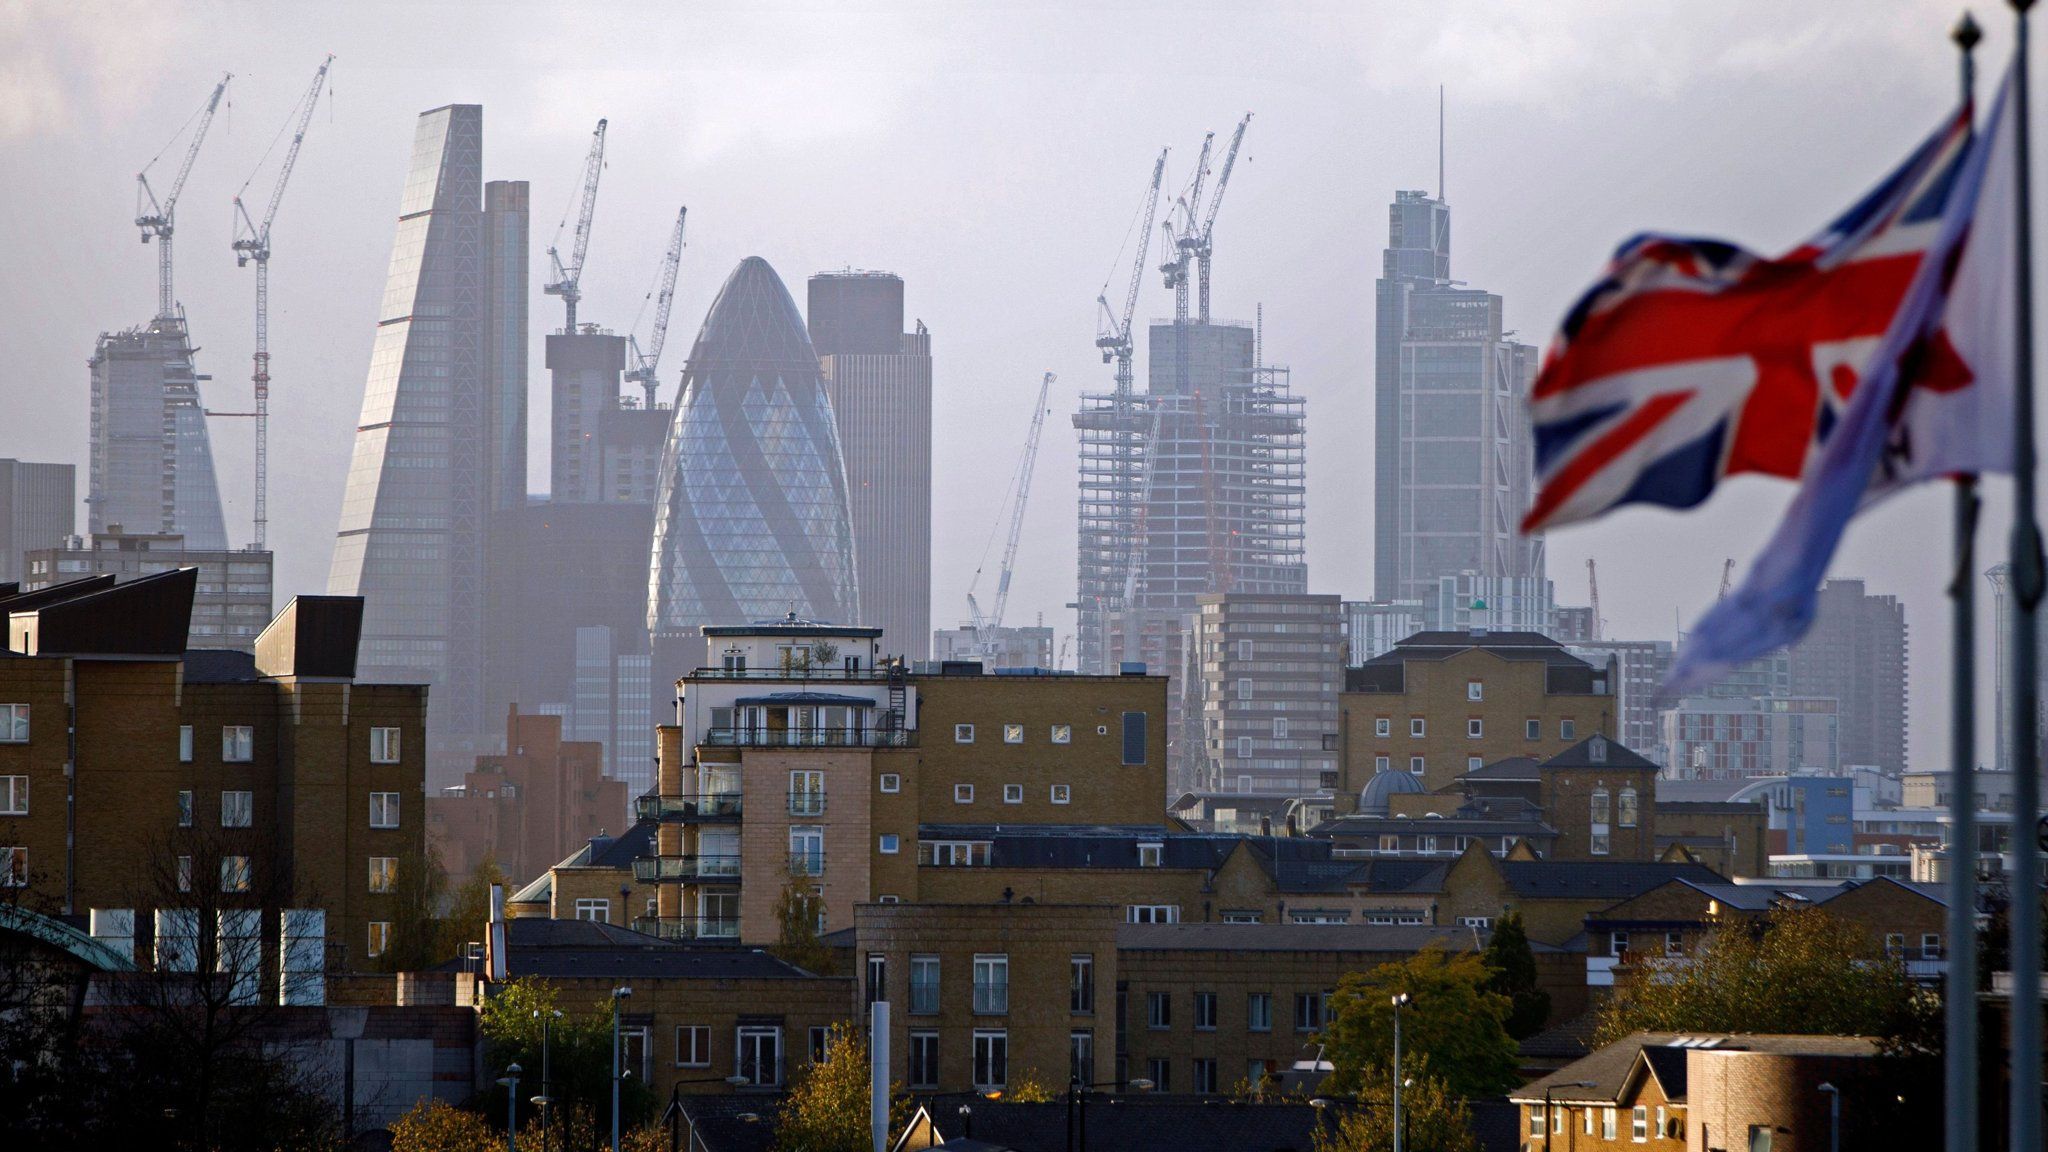 ft.com - Jennifer Thompson - UK asset management sector passes £9tn milestone